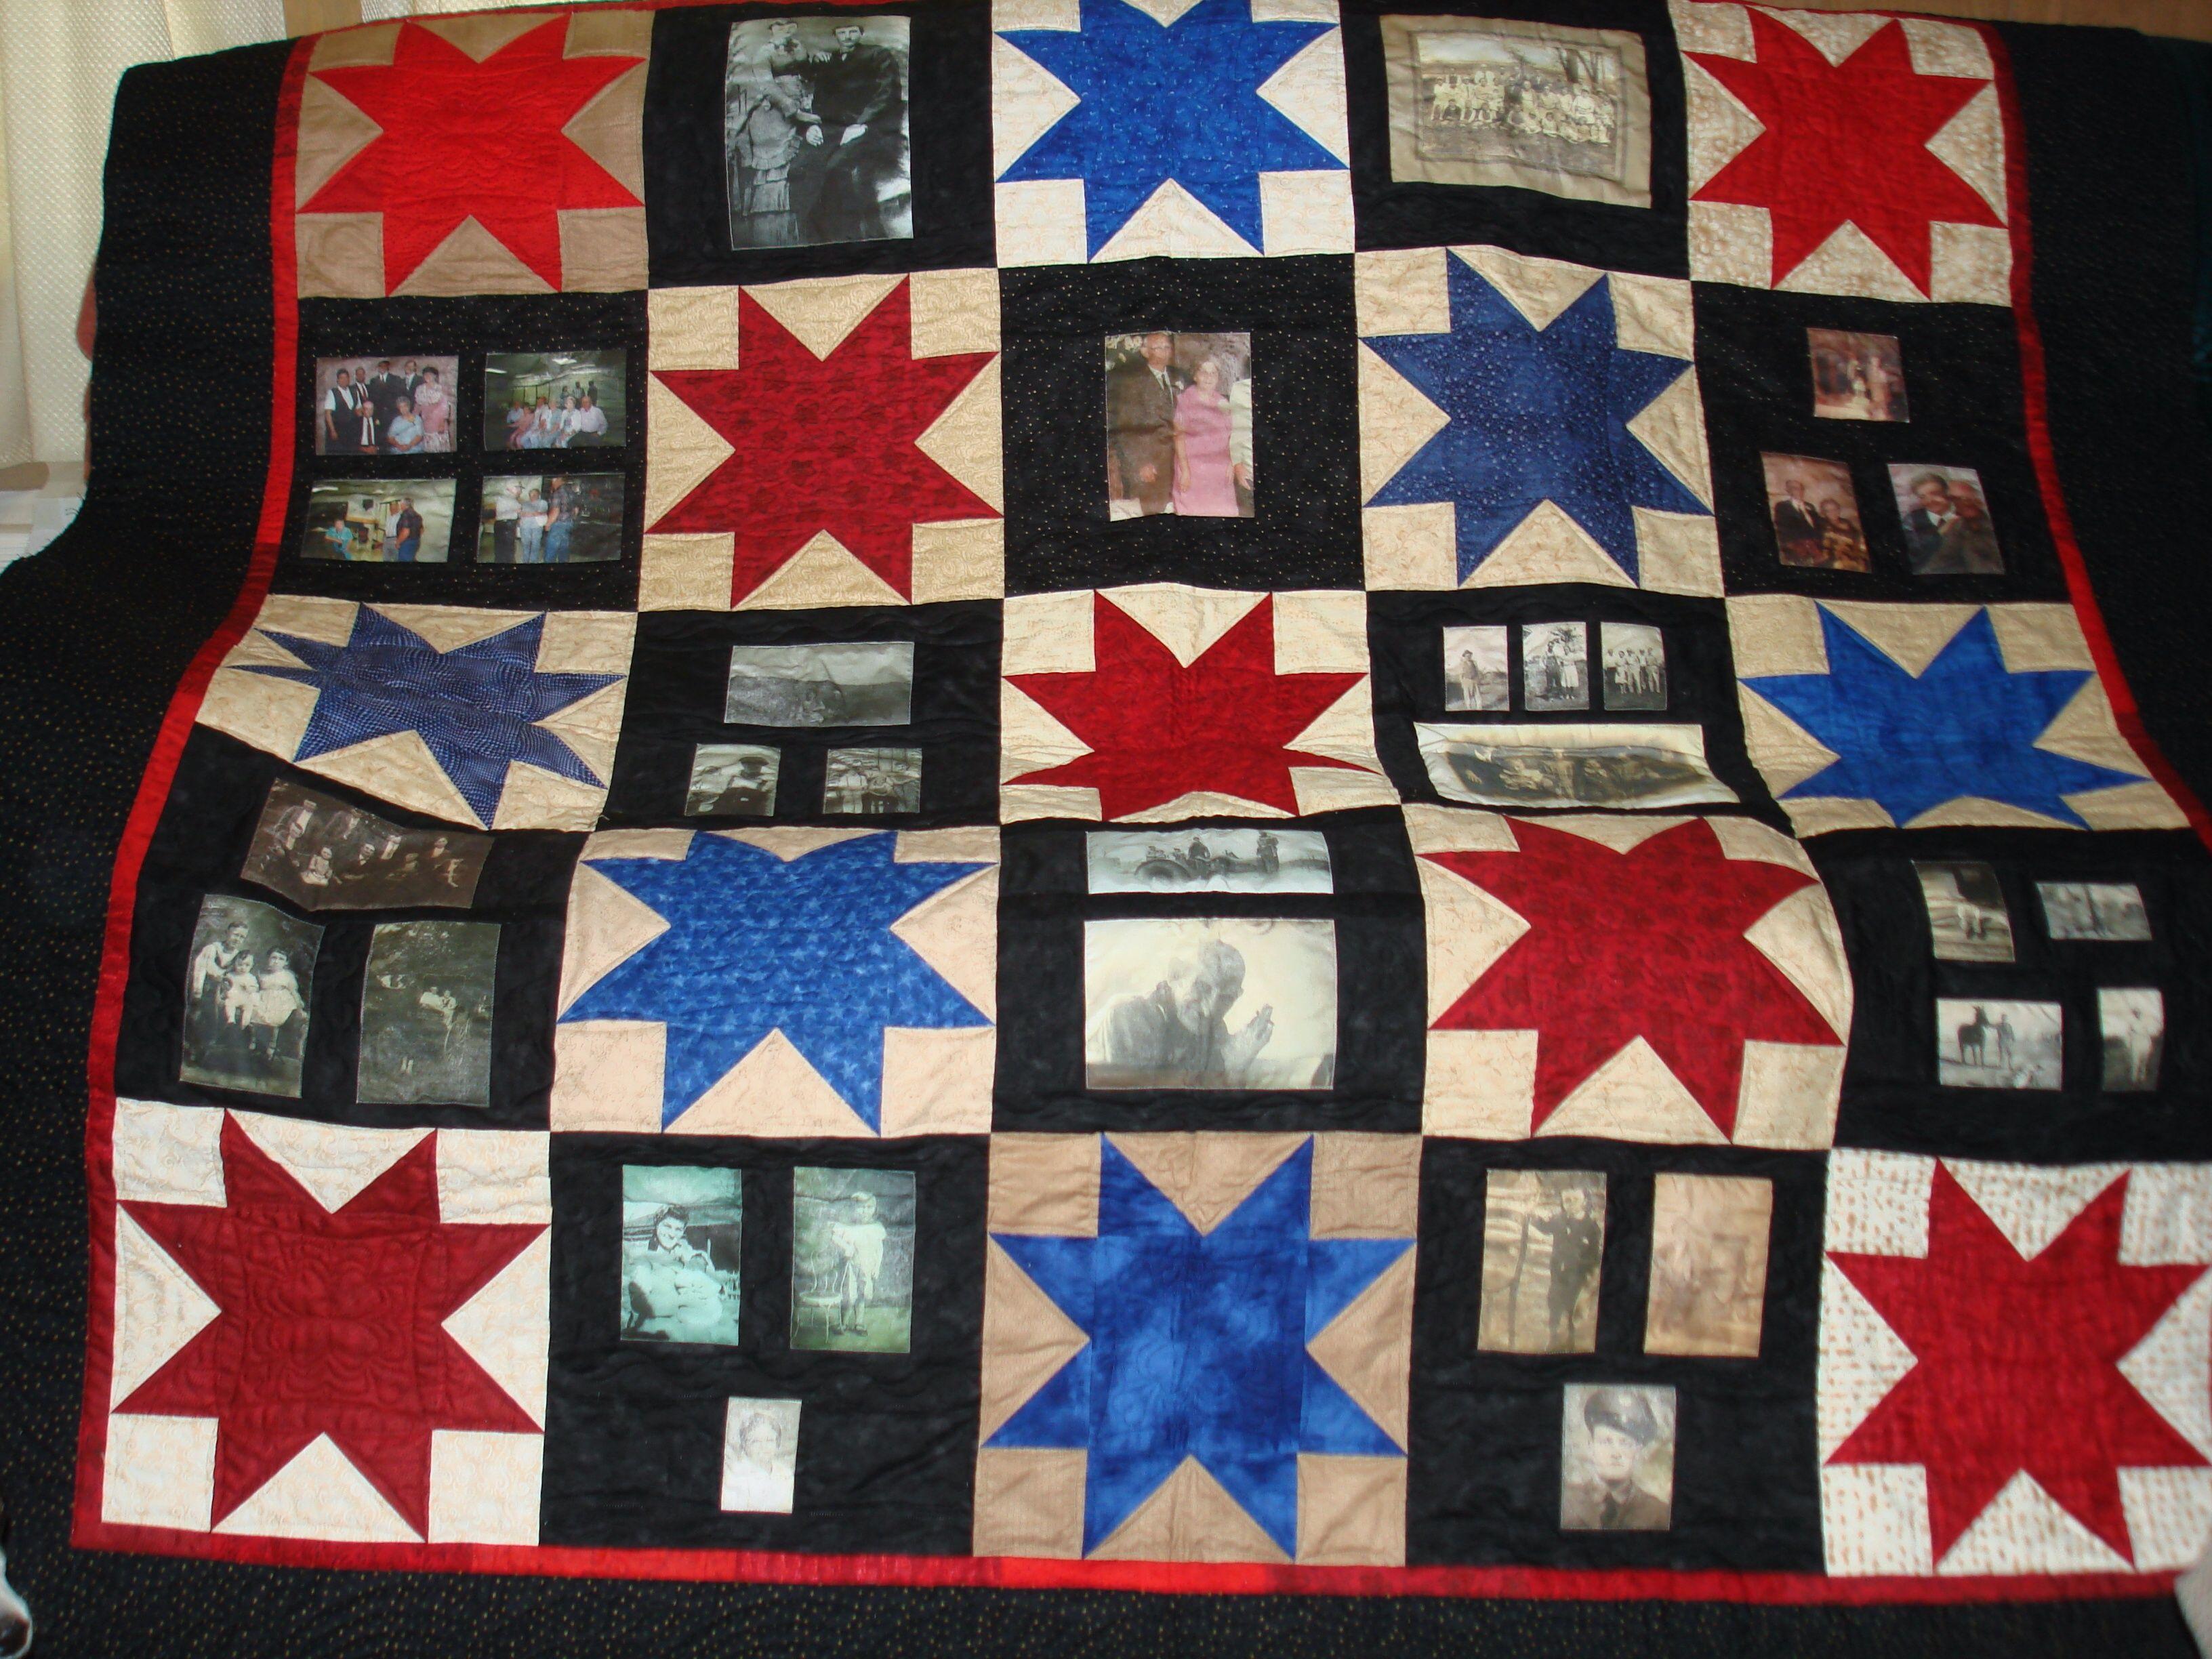 photo memory quilt | my quilts | pinterest | photo memories, photo